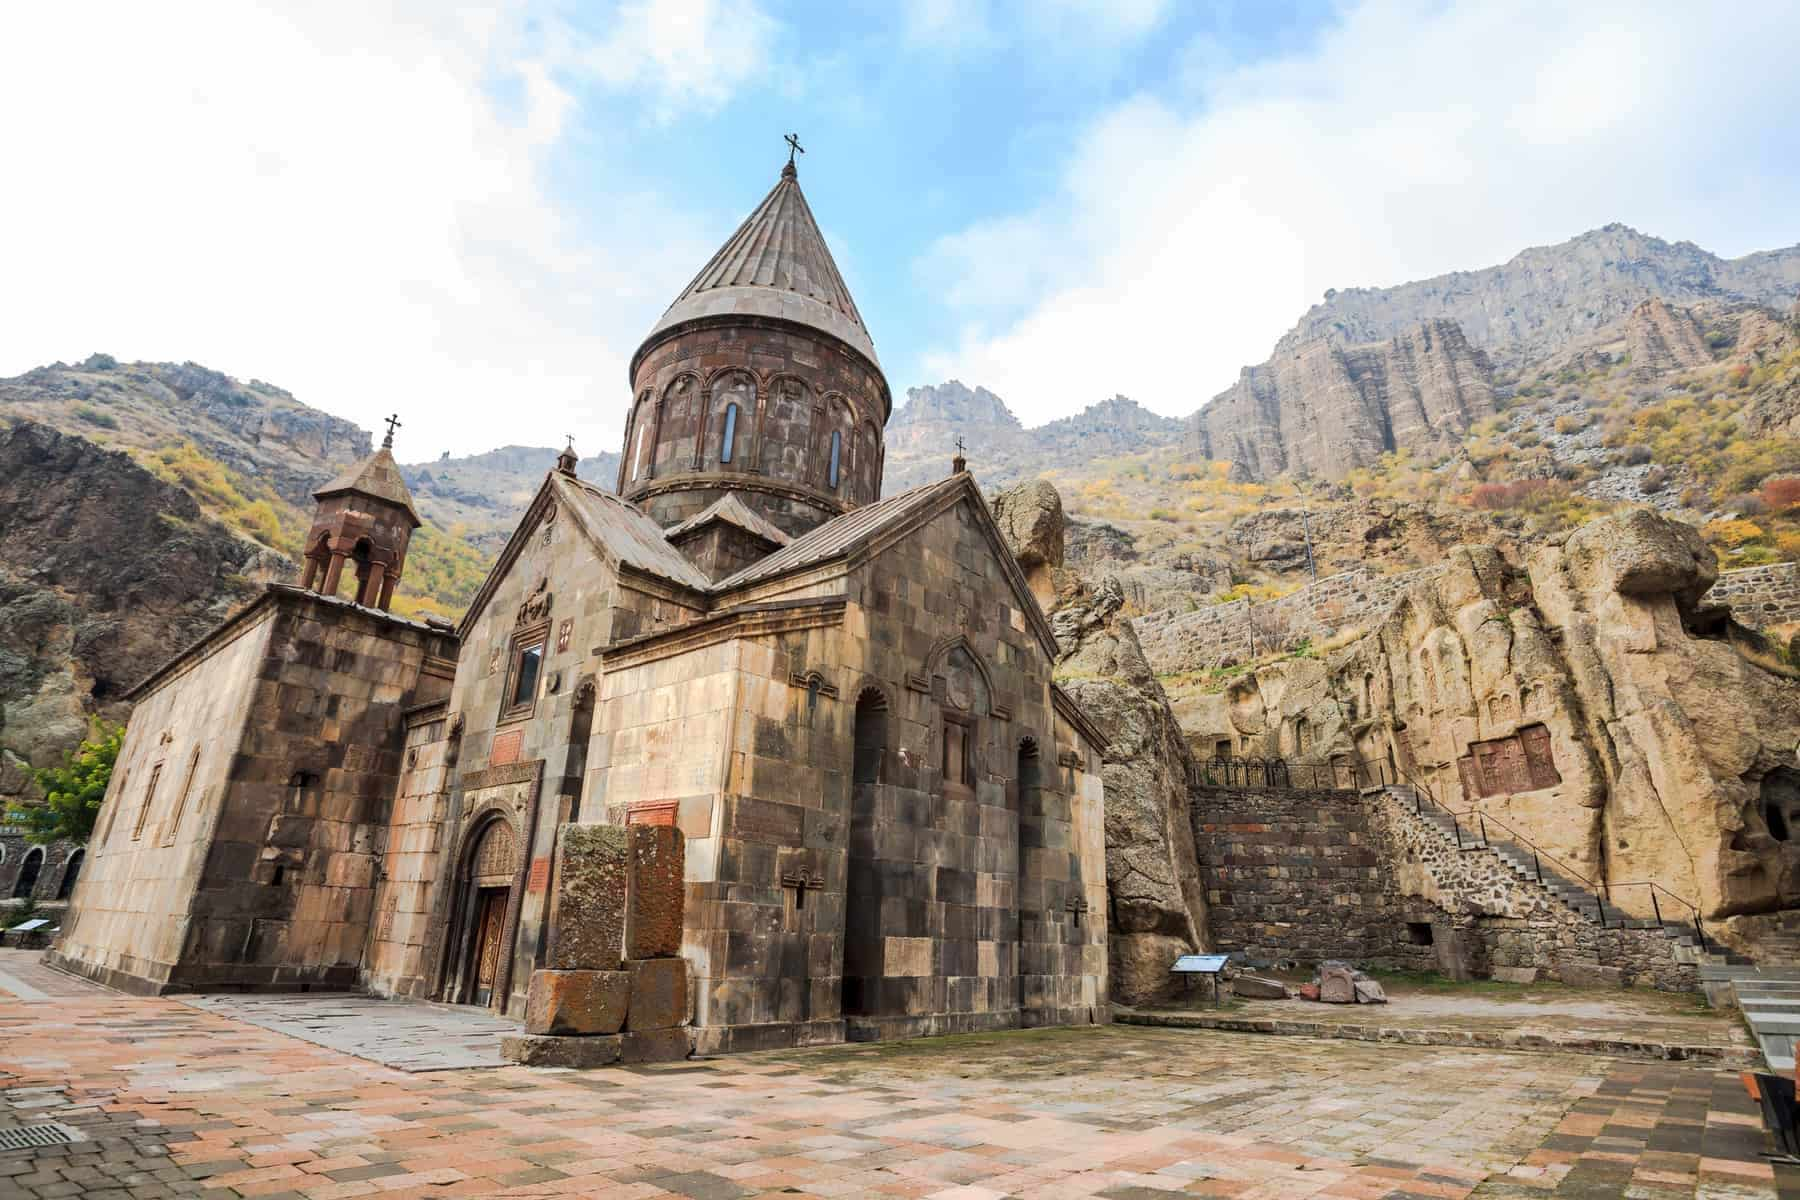 Monastery of Geghard is an Orthodox Christian monastery located in Kotayk Province of Armenia